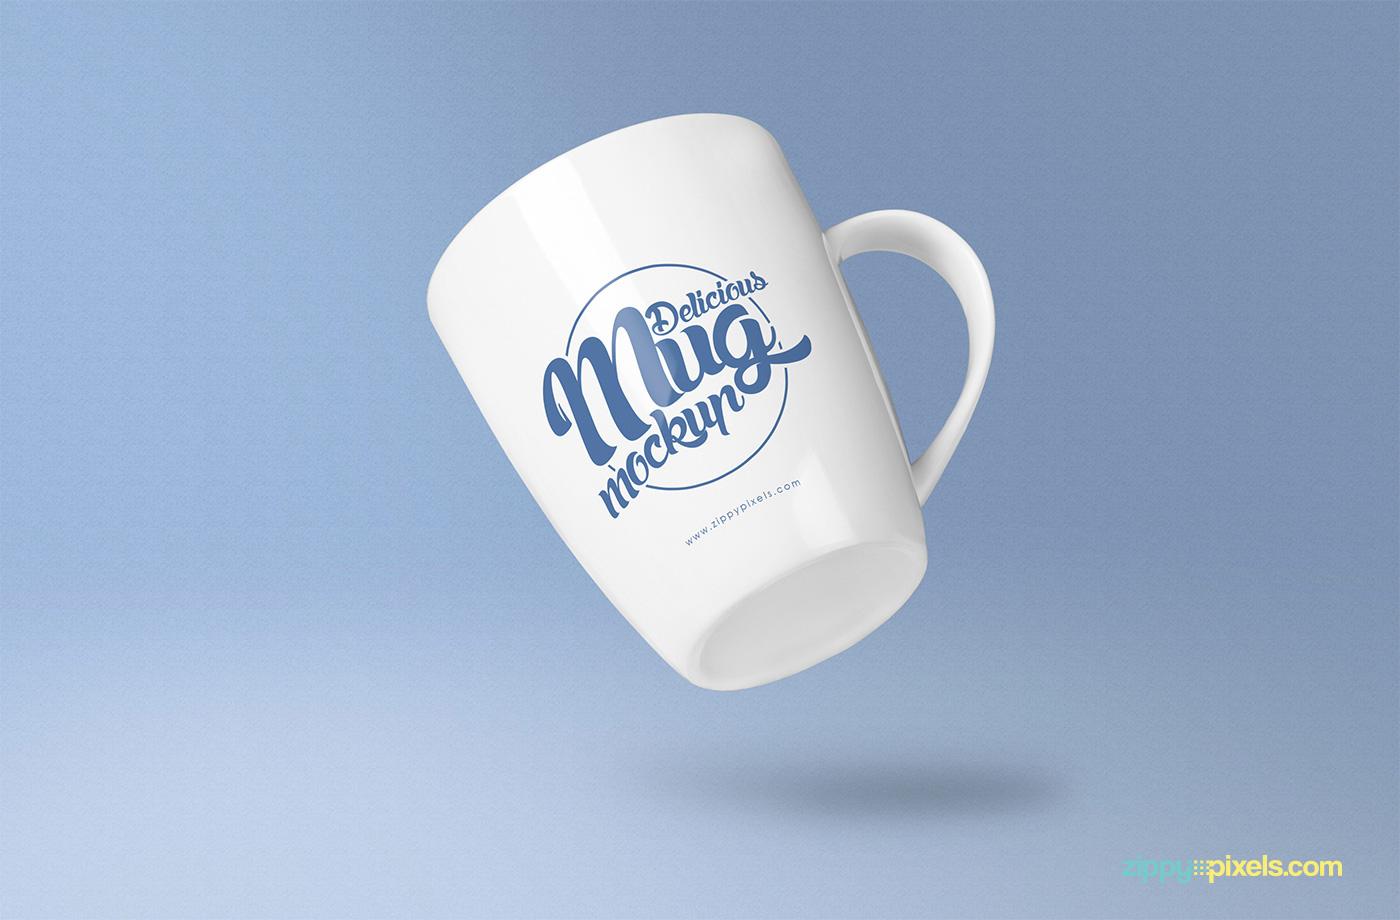 free freebie Mockup mockups Mug  psd coffee mug photoshop presentation Branding design photorealistic logo merchandising promotional design